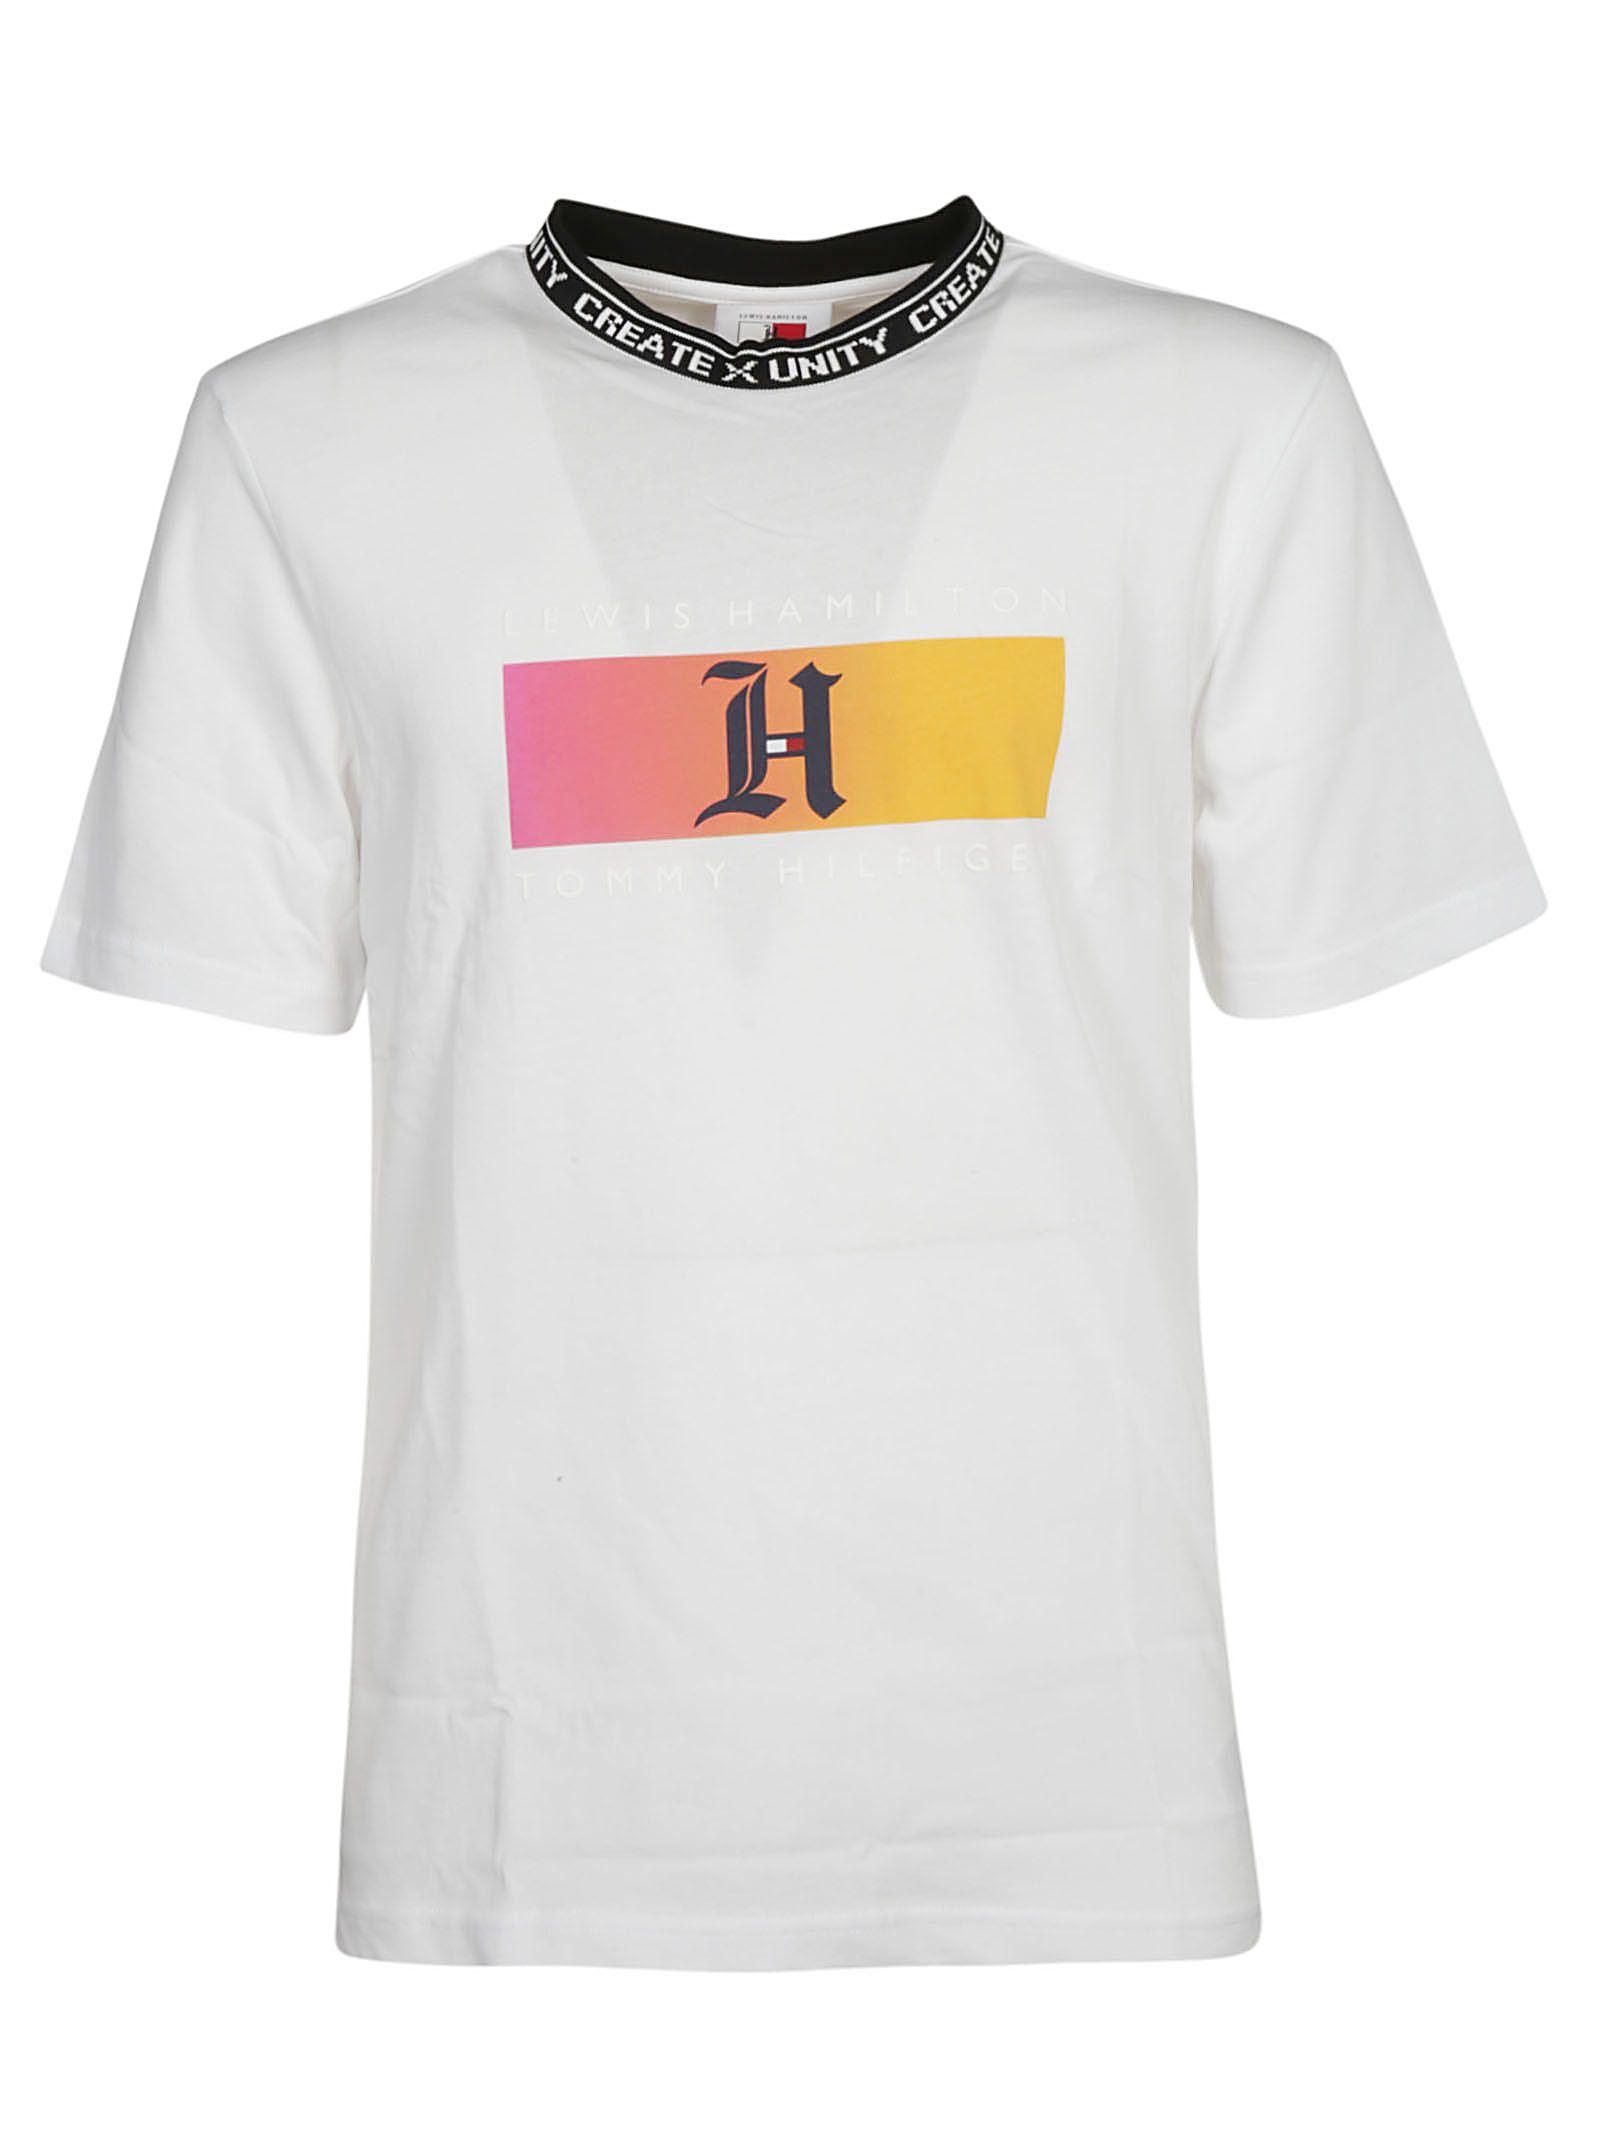 6e2f2fa3d Tommy Hilfiger Tommy Hilfiger Lewis Hamilton Ombre Monogram T-shirt ...